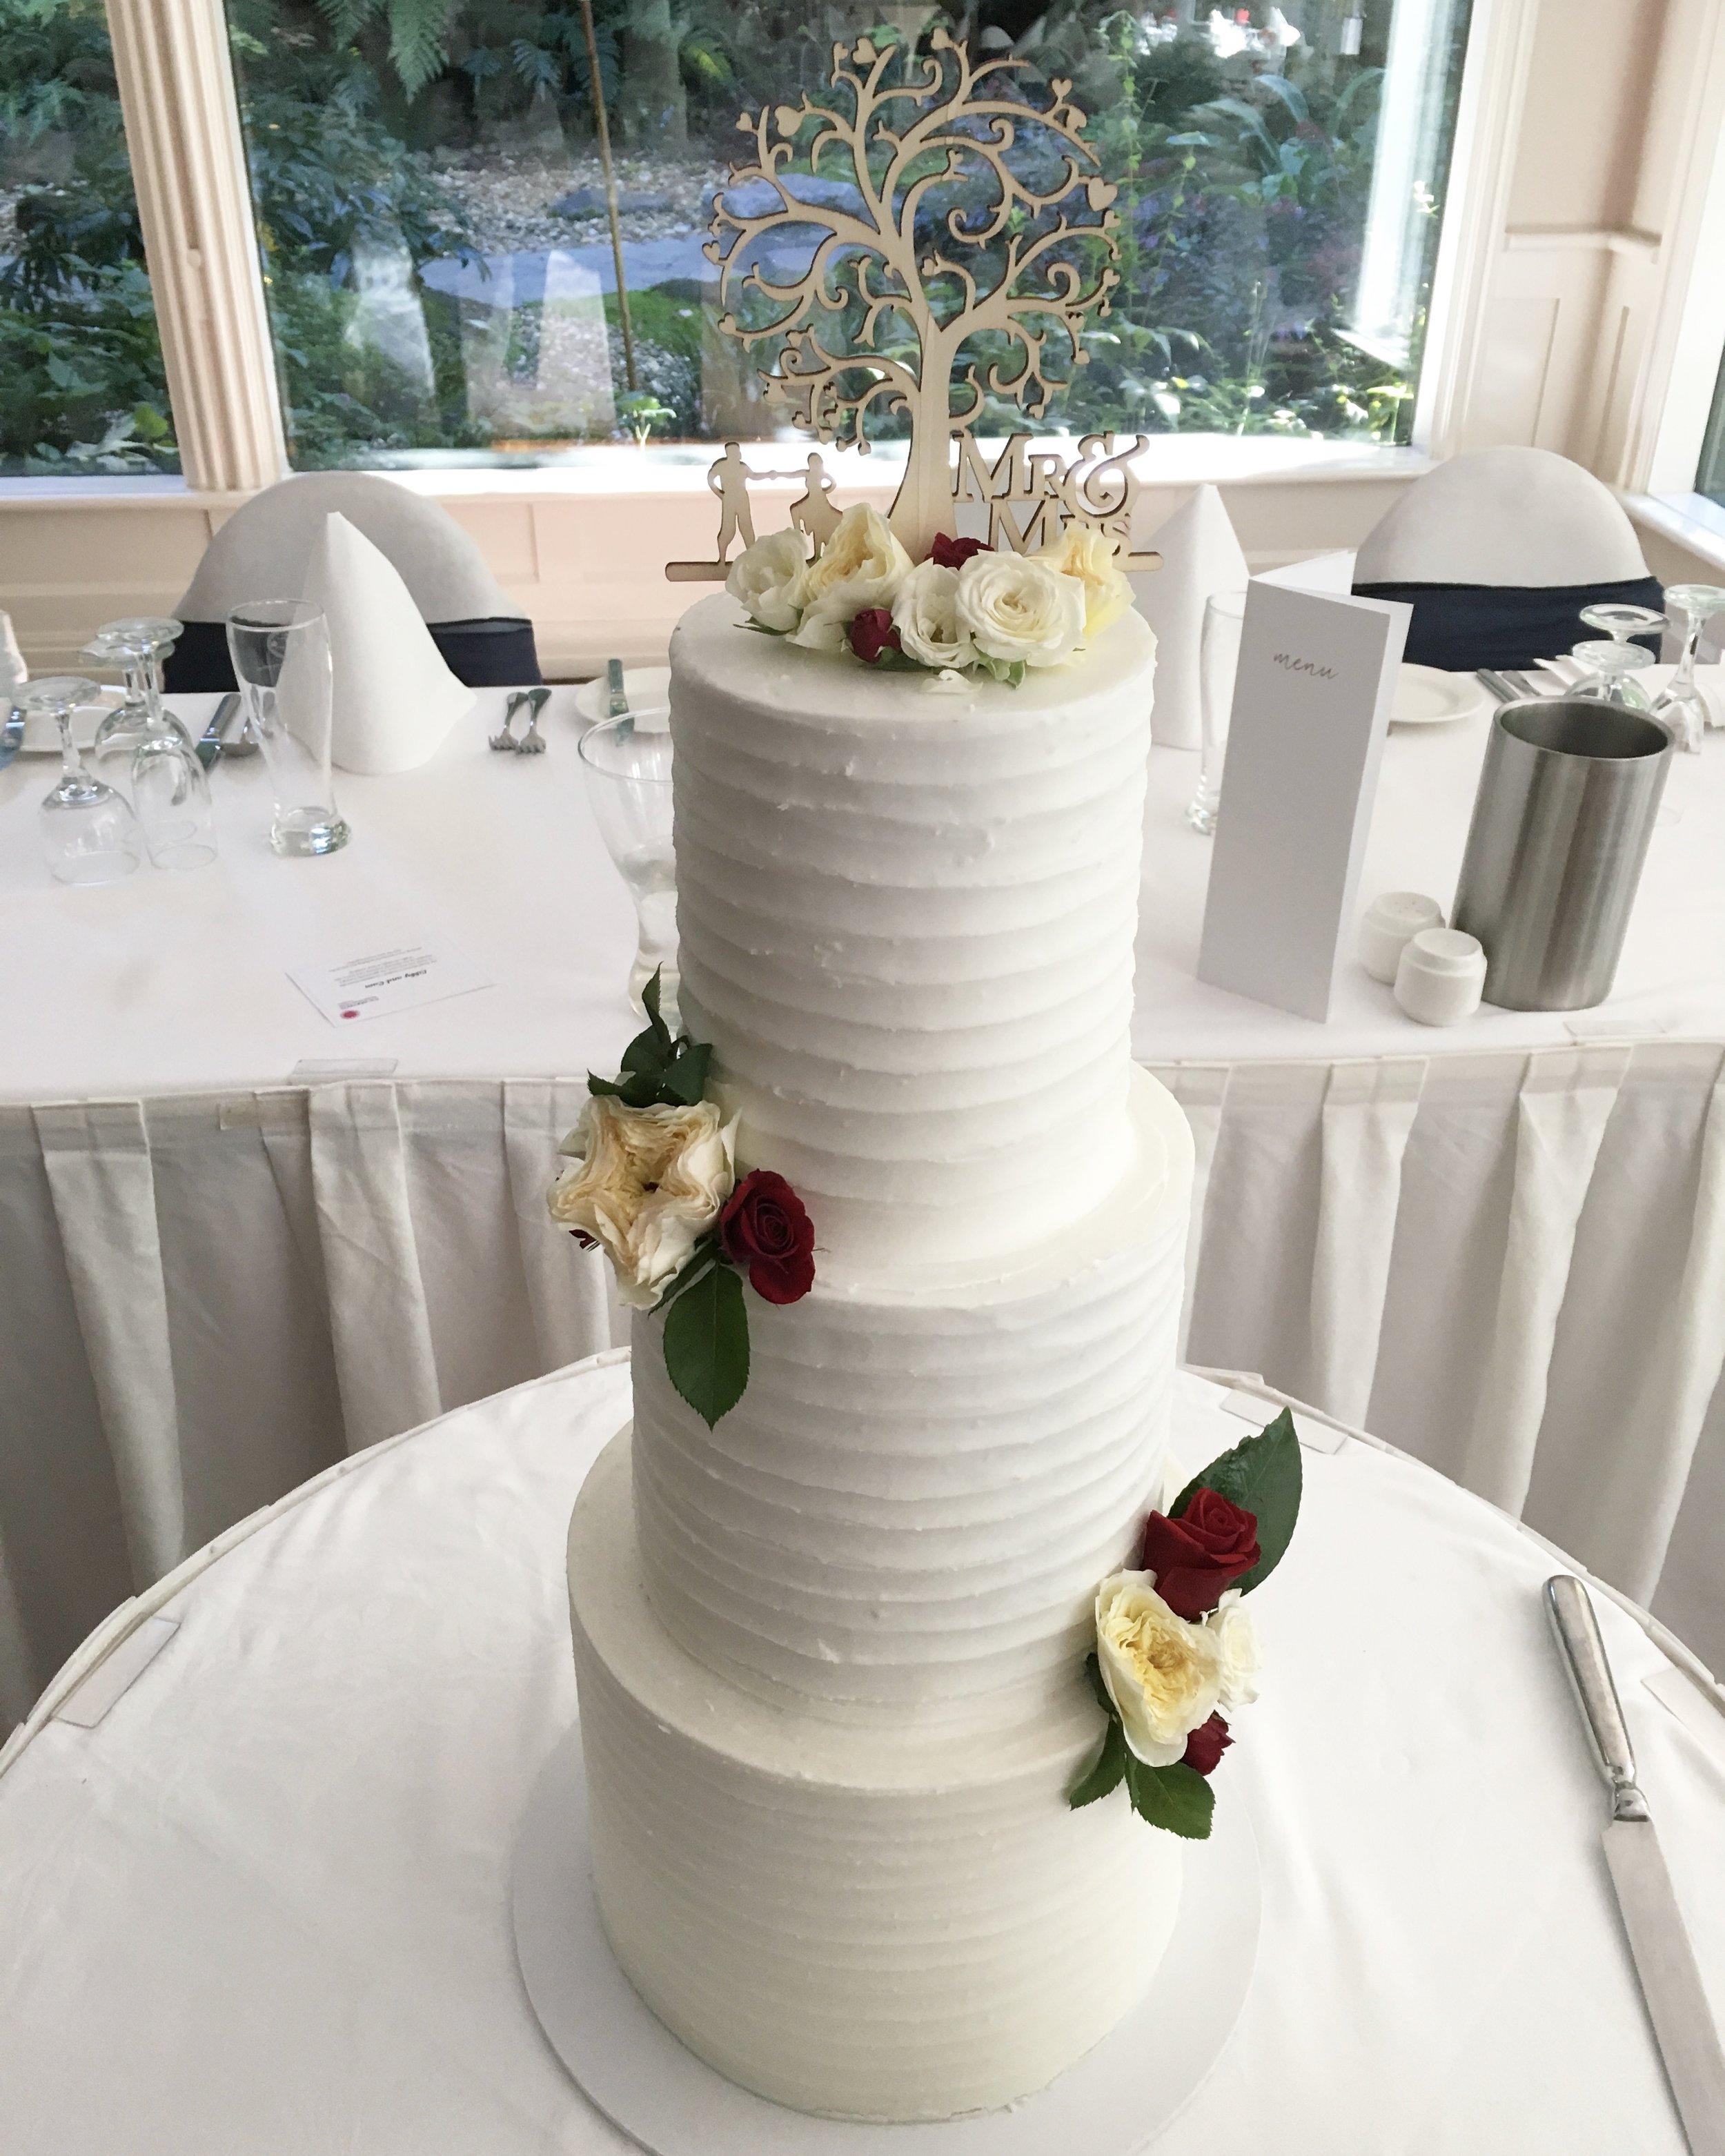 Copy of Horizontal Lined Buttercream Cake